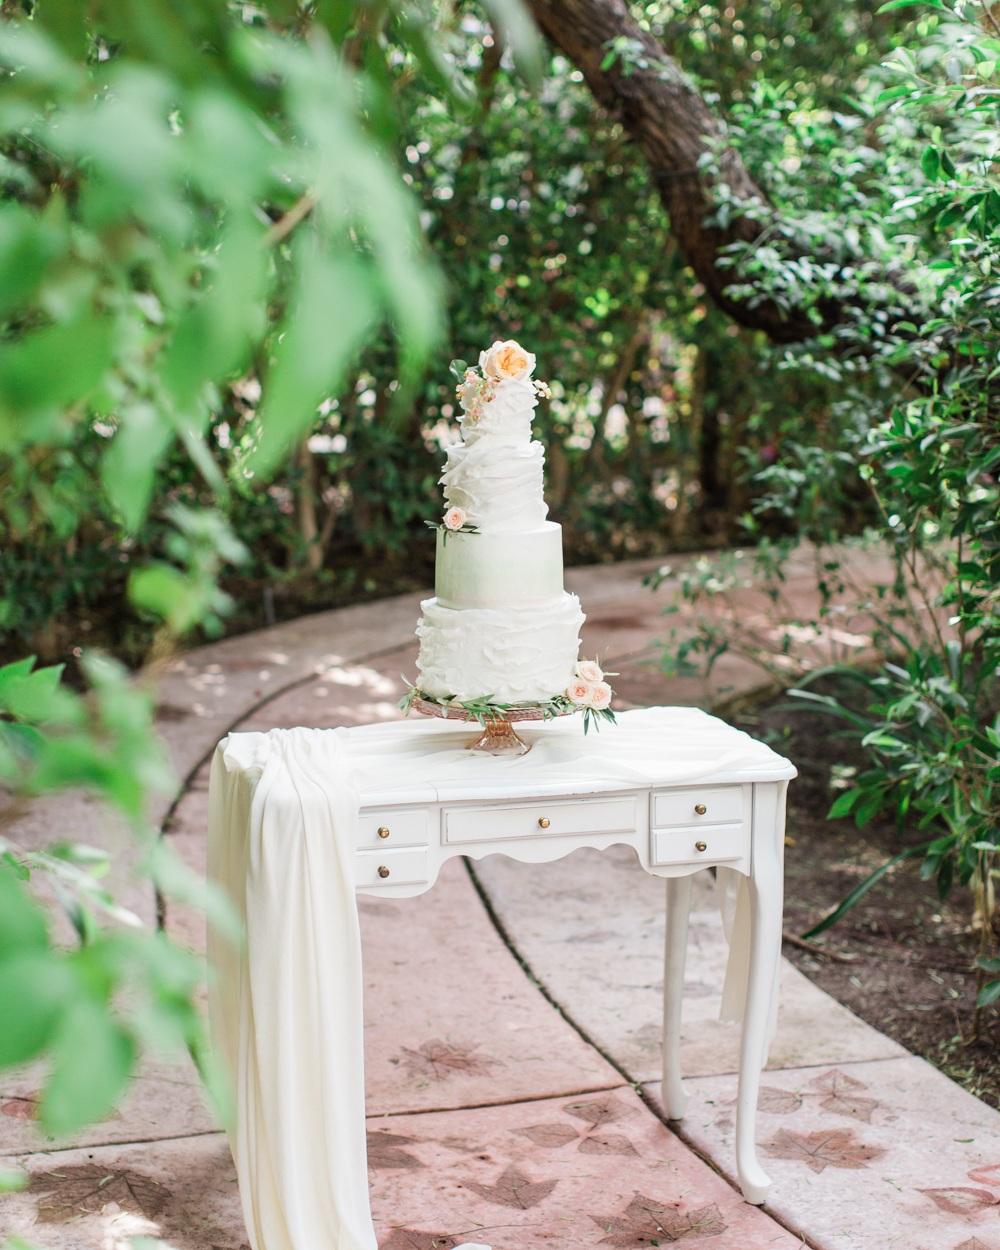 edengardens_wedding_loie_photography_038.jpg